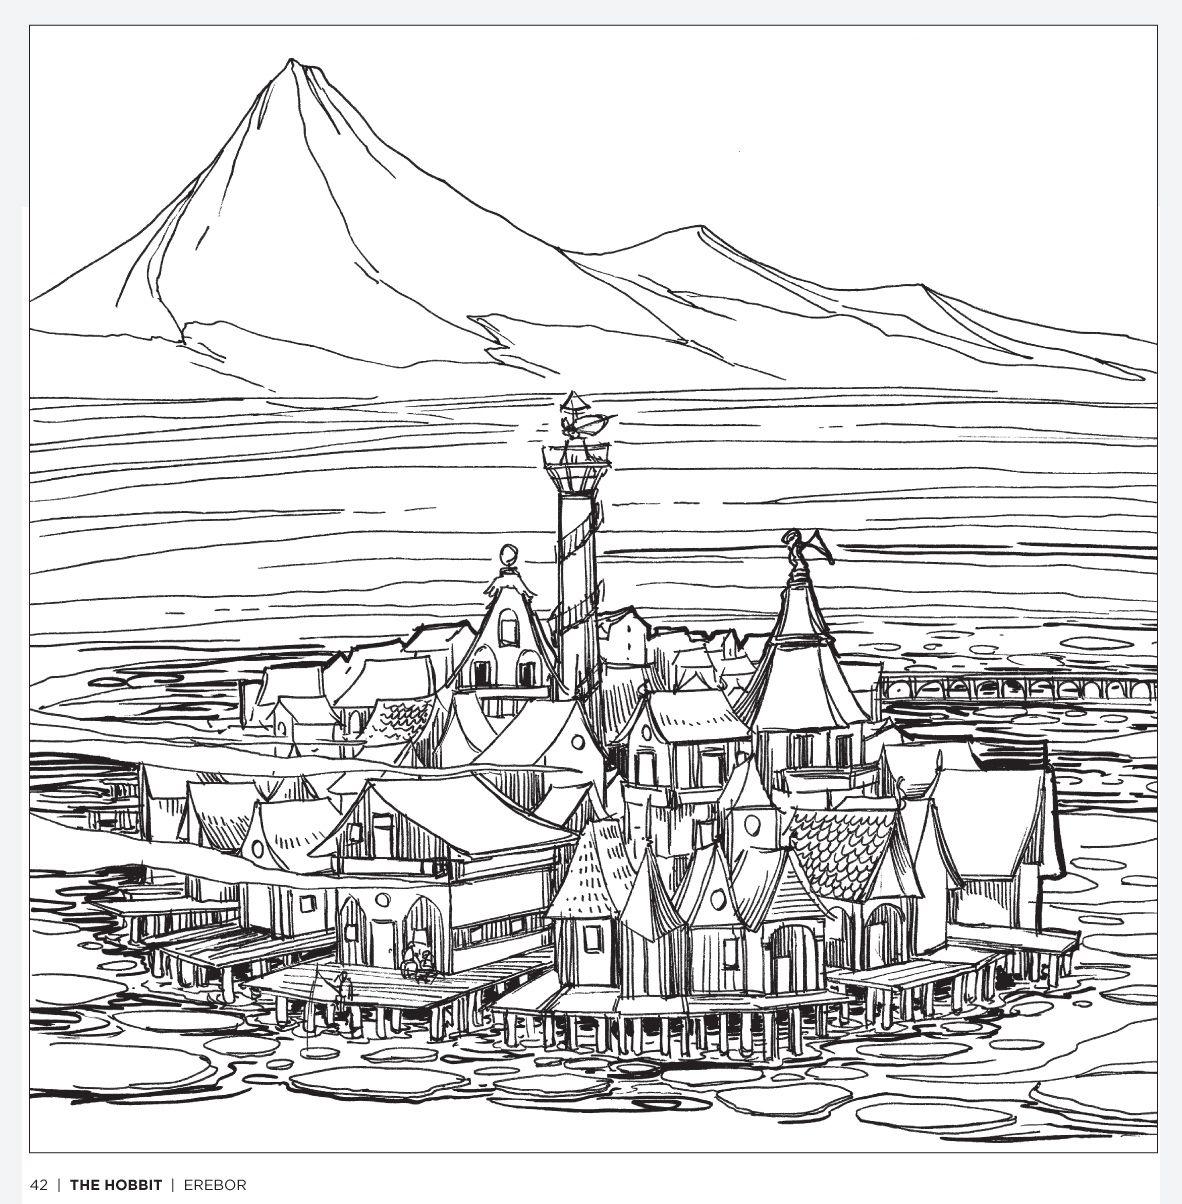 Pin by M. Lyman on Hobbit | Pinterest | Hobbit and Tolkien